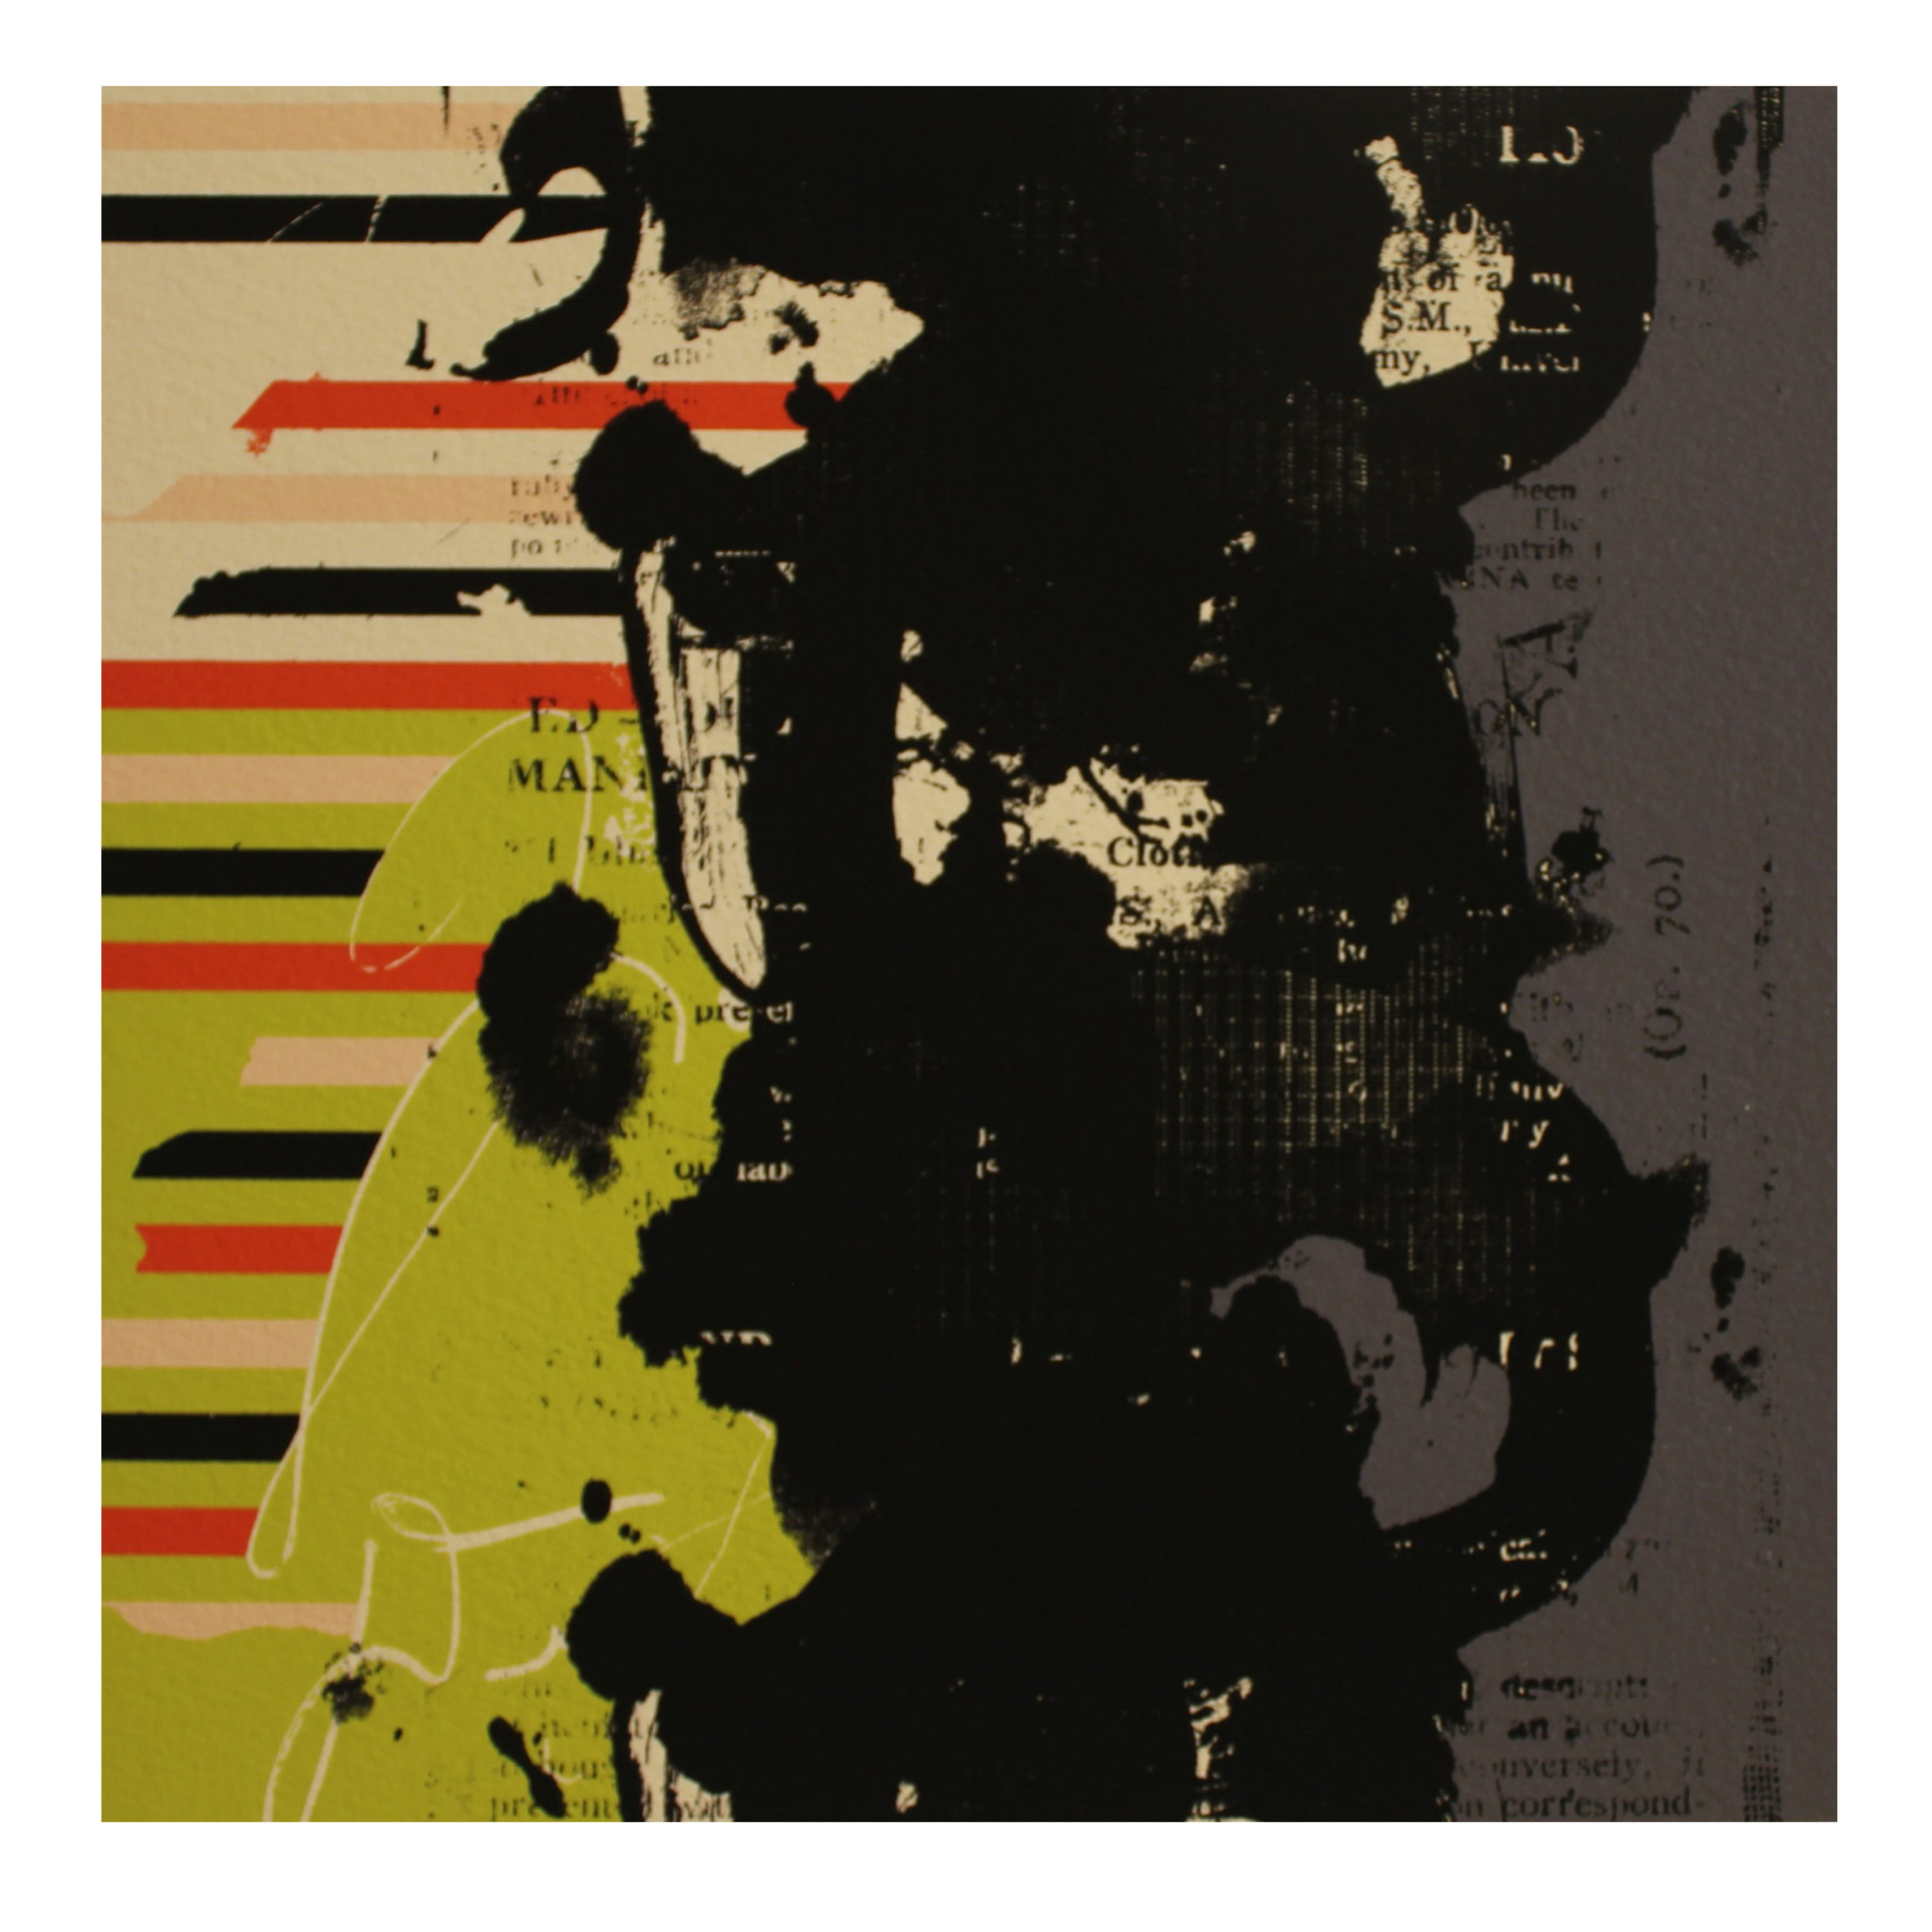 Eric Field, Untitled (14:05), 2016, archival digital pigment print